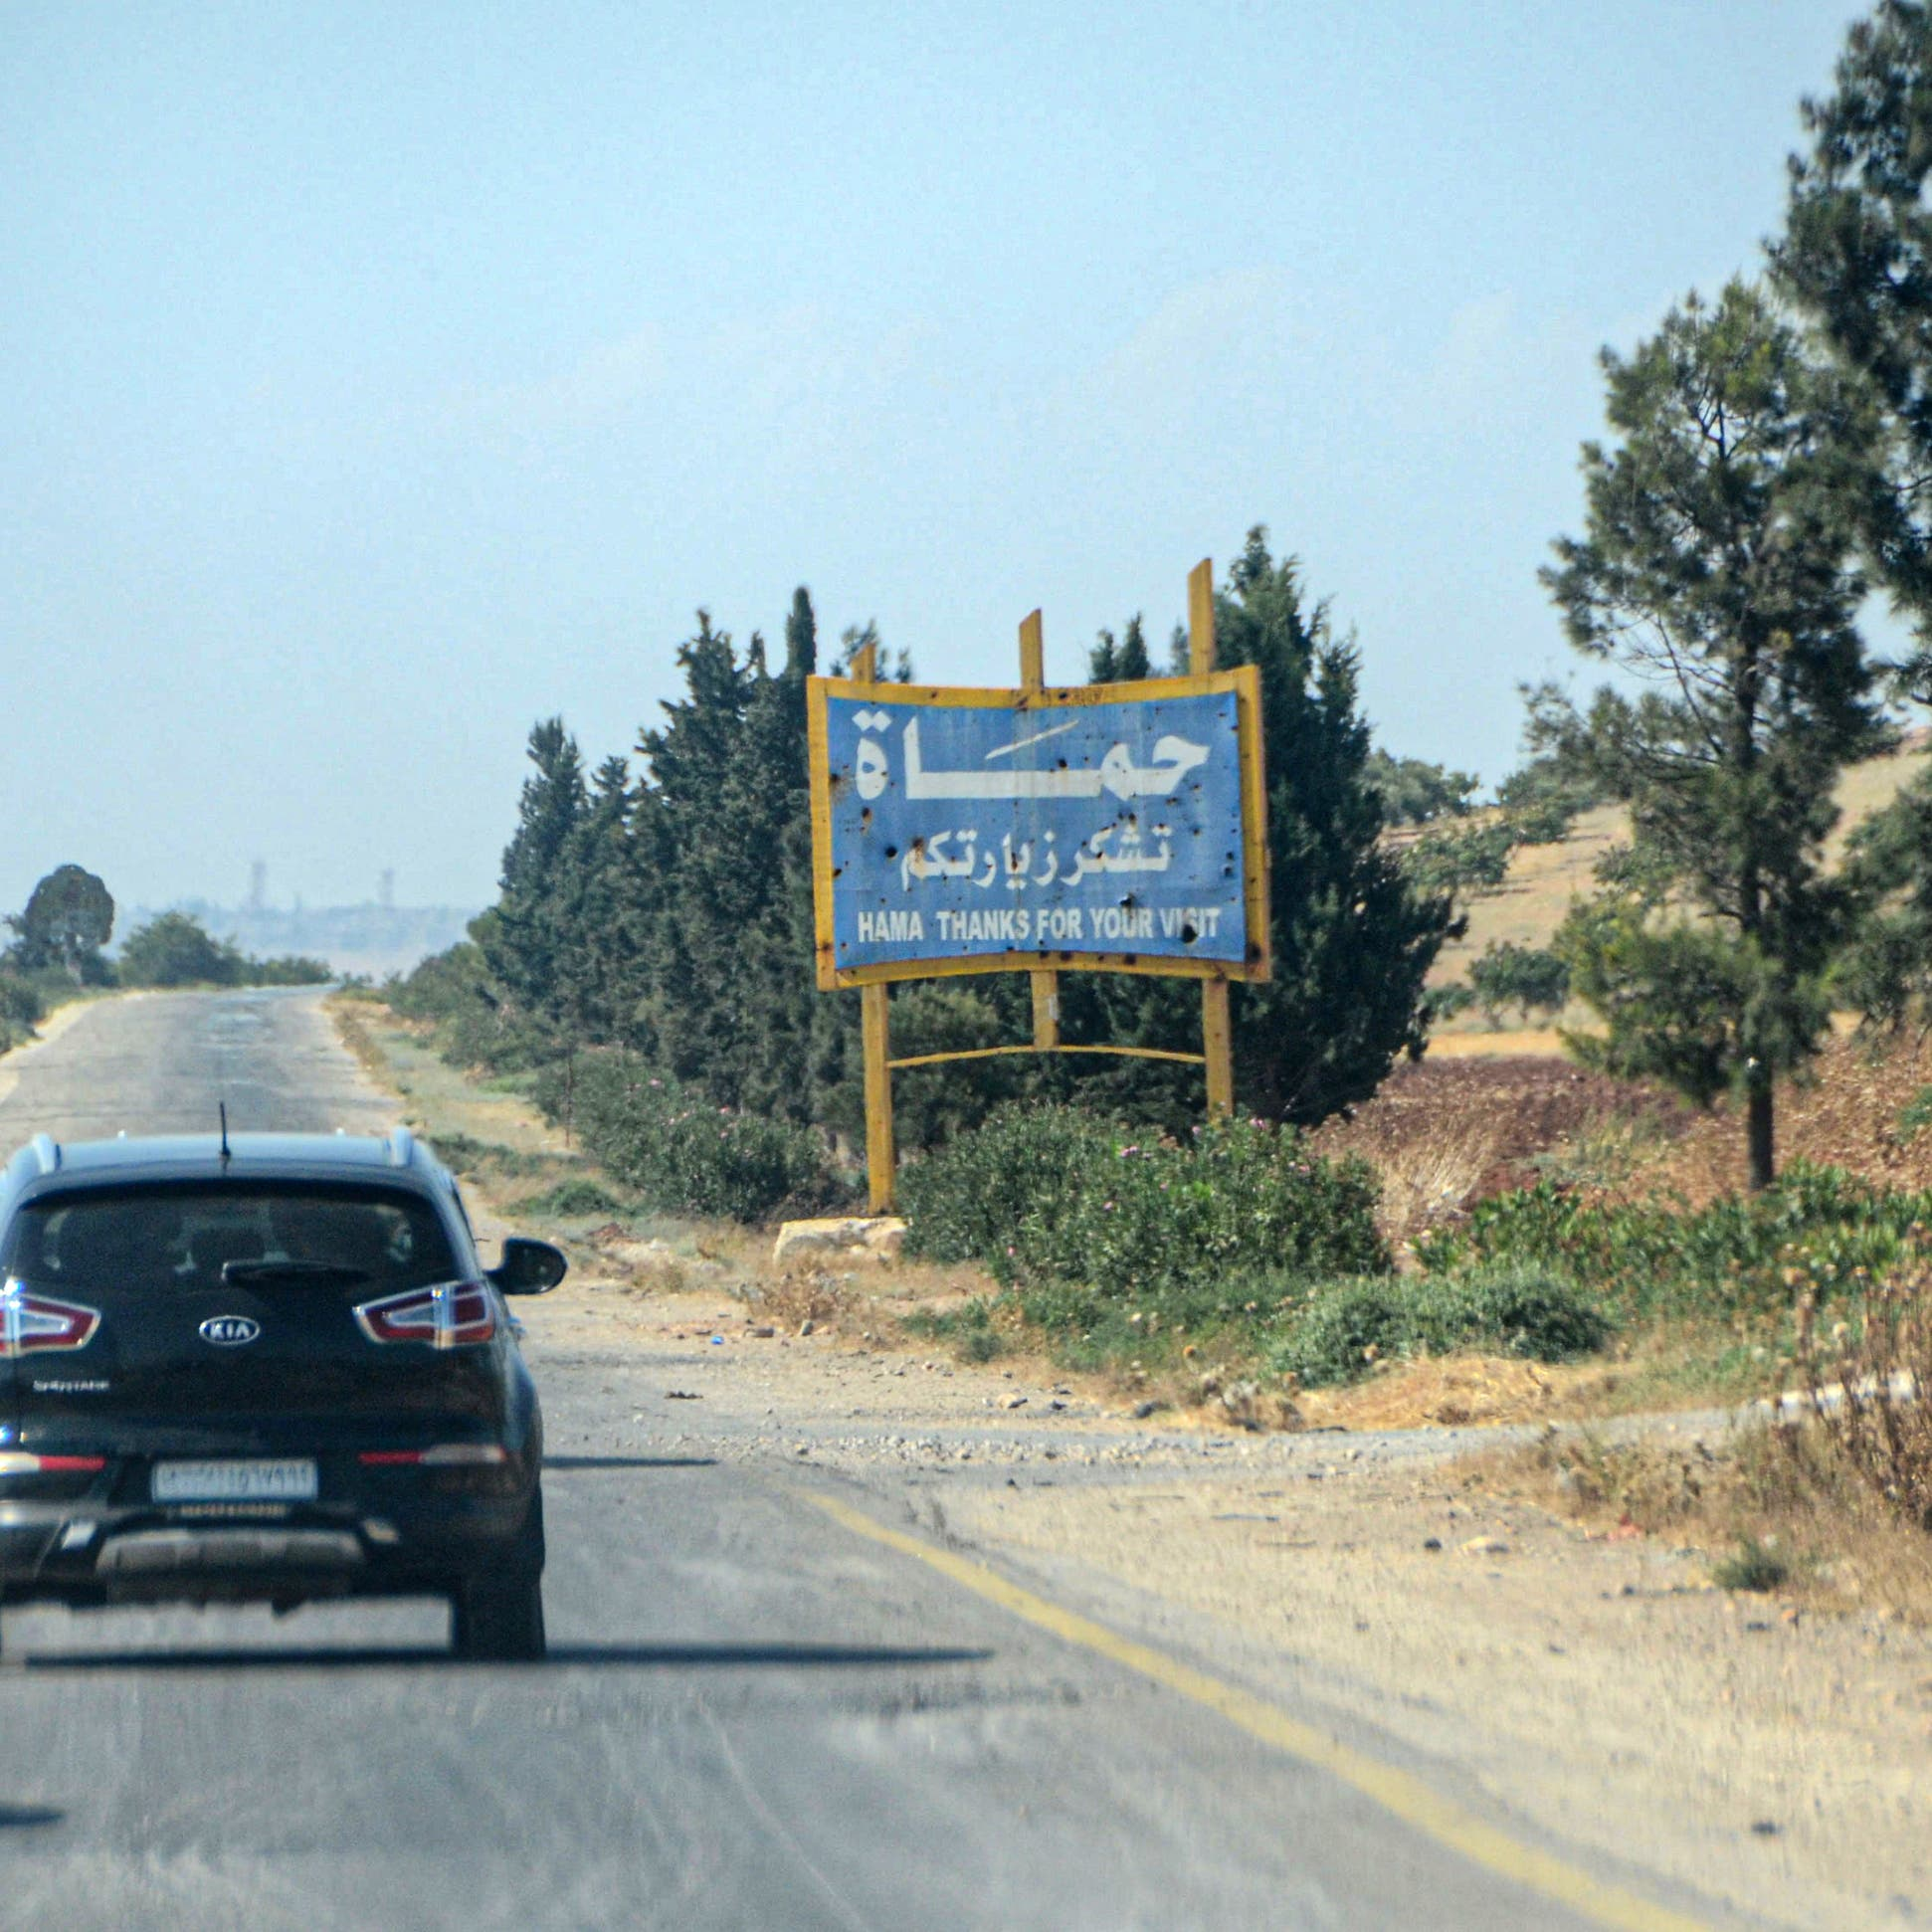 مجدداً.. غارات مجهولة تستهدف مواقع في حماة وريف دمشق